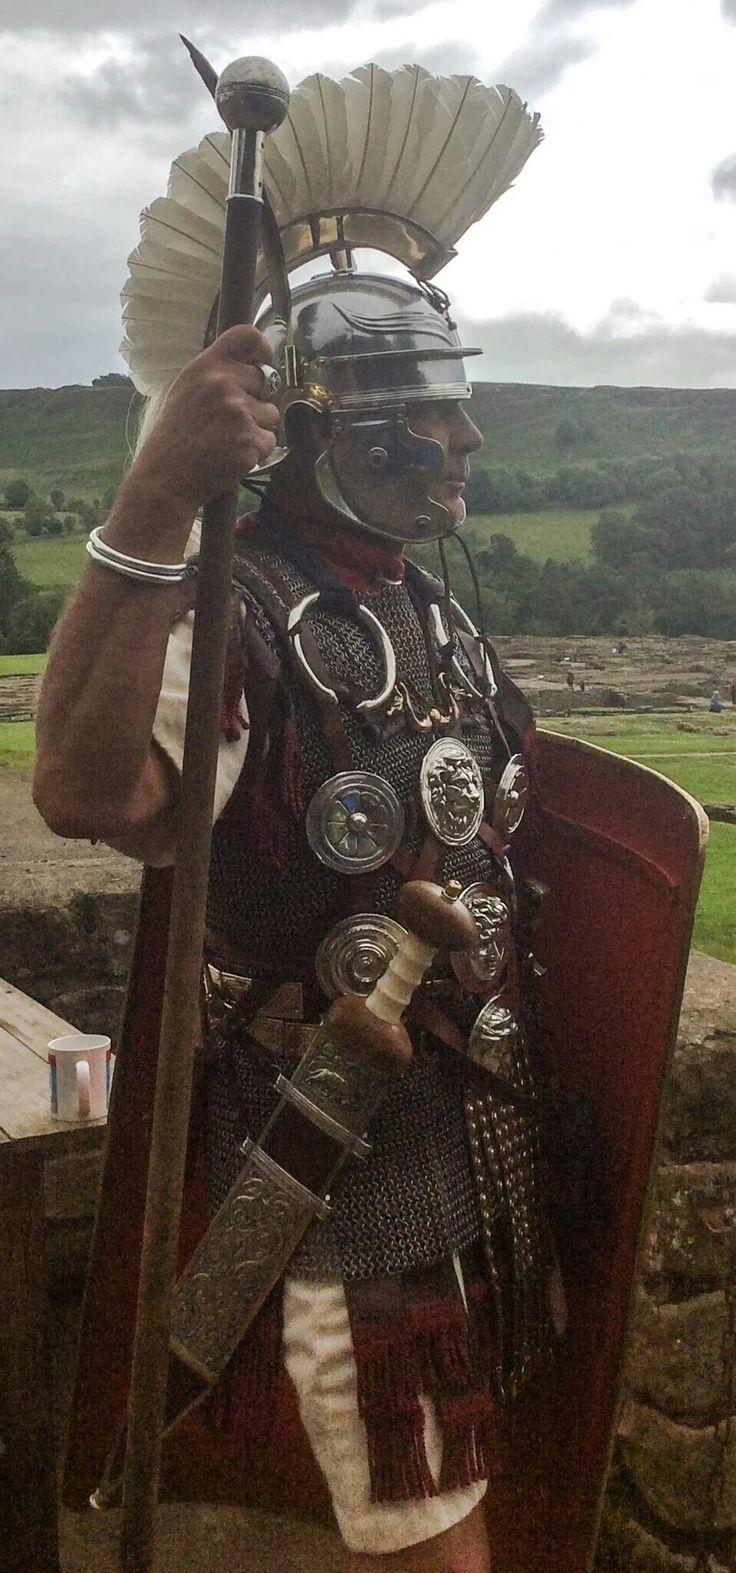 Roman centurion                                                                                                                                                                                 More